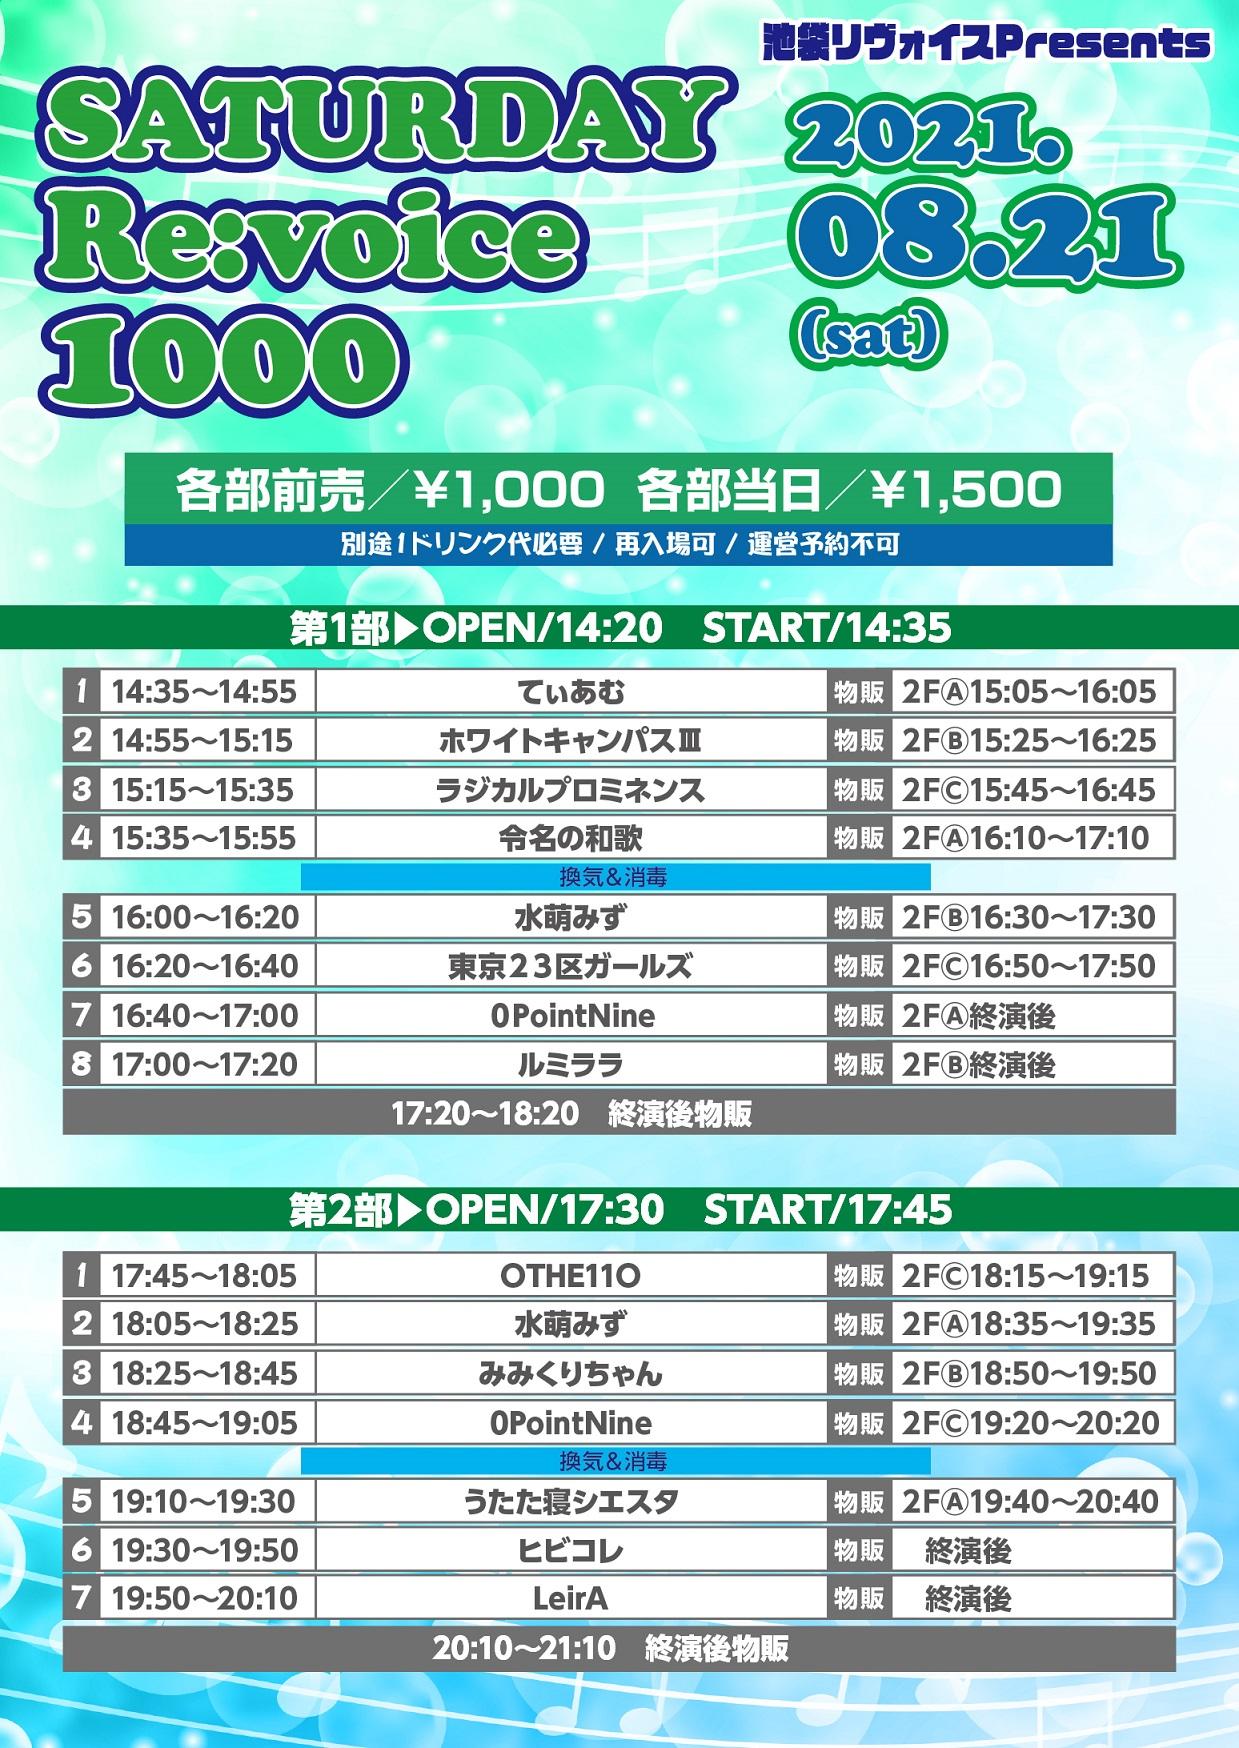 【第一部】SATURDAY Re:voice 1000